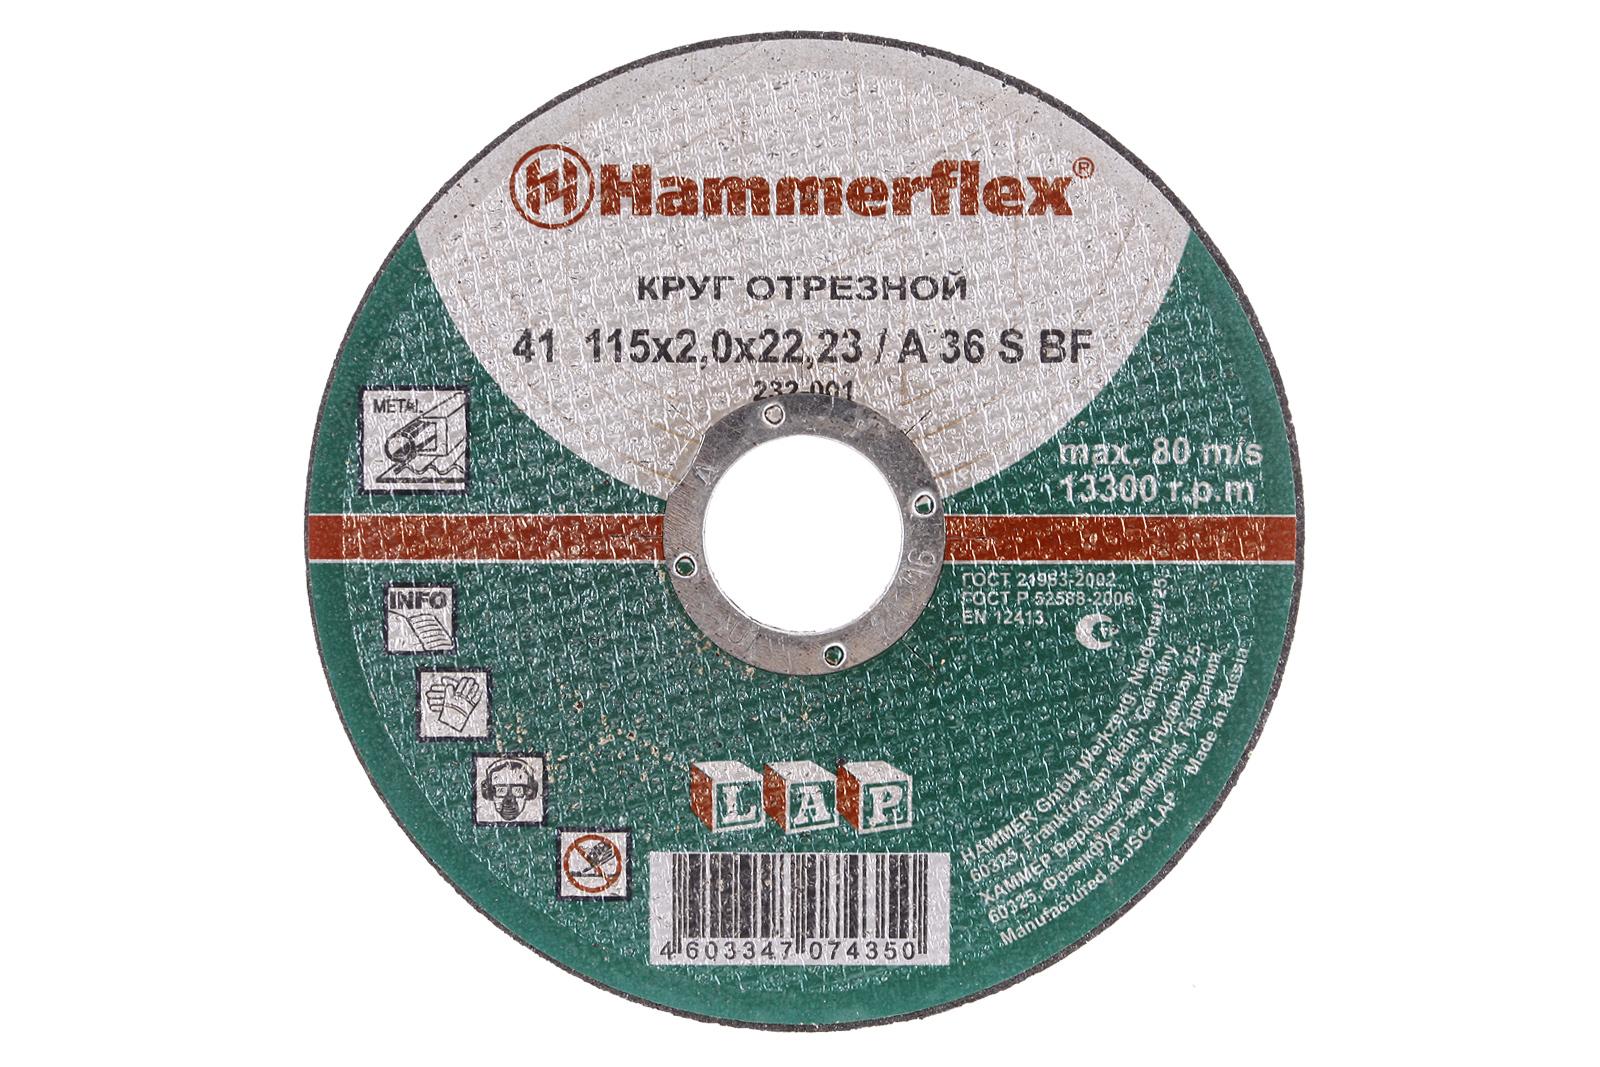 Круг отрезной Hammer 115 x 2.0 x 22 по металлу Коробка (200шт.) круг отрезной hammer 150 x 2 0 x 22 по металлу коробка 200шт